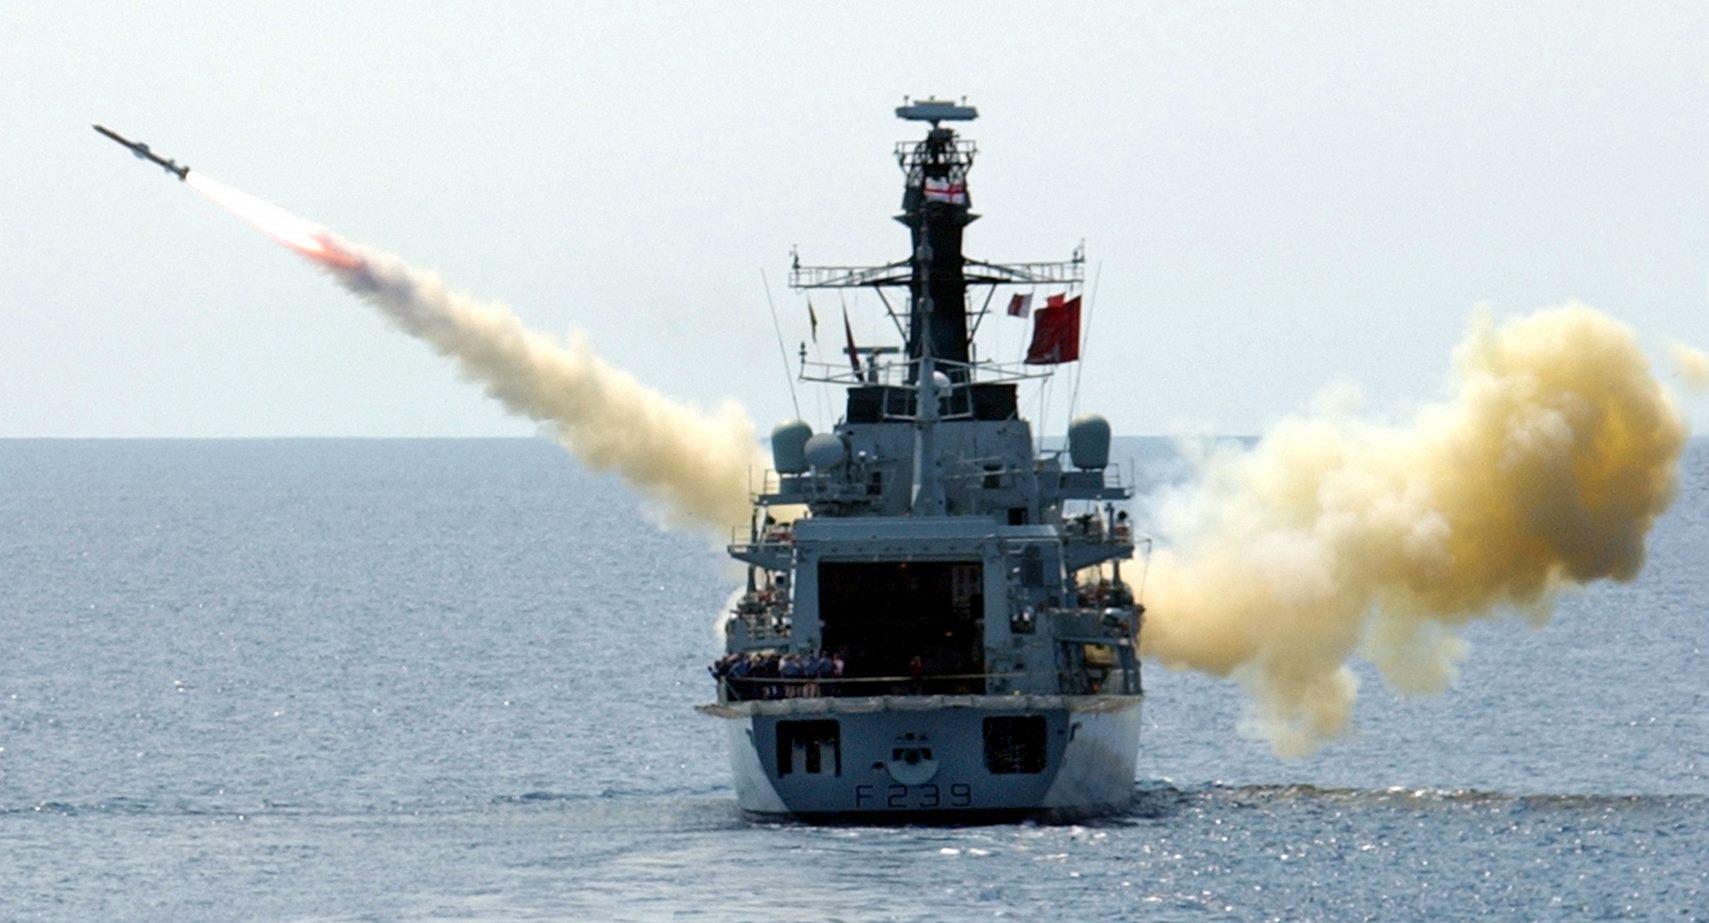 image of HMS Richmond